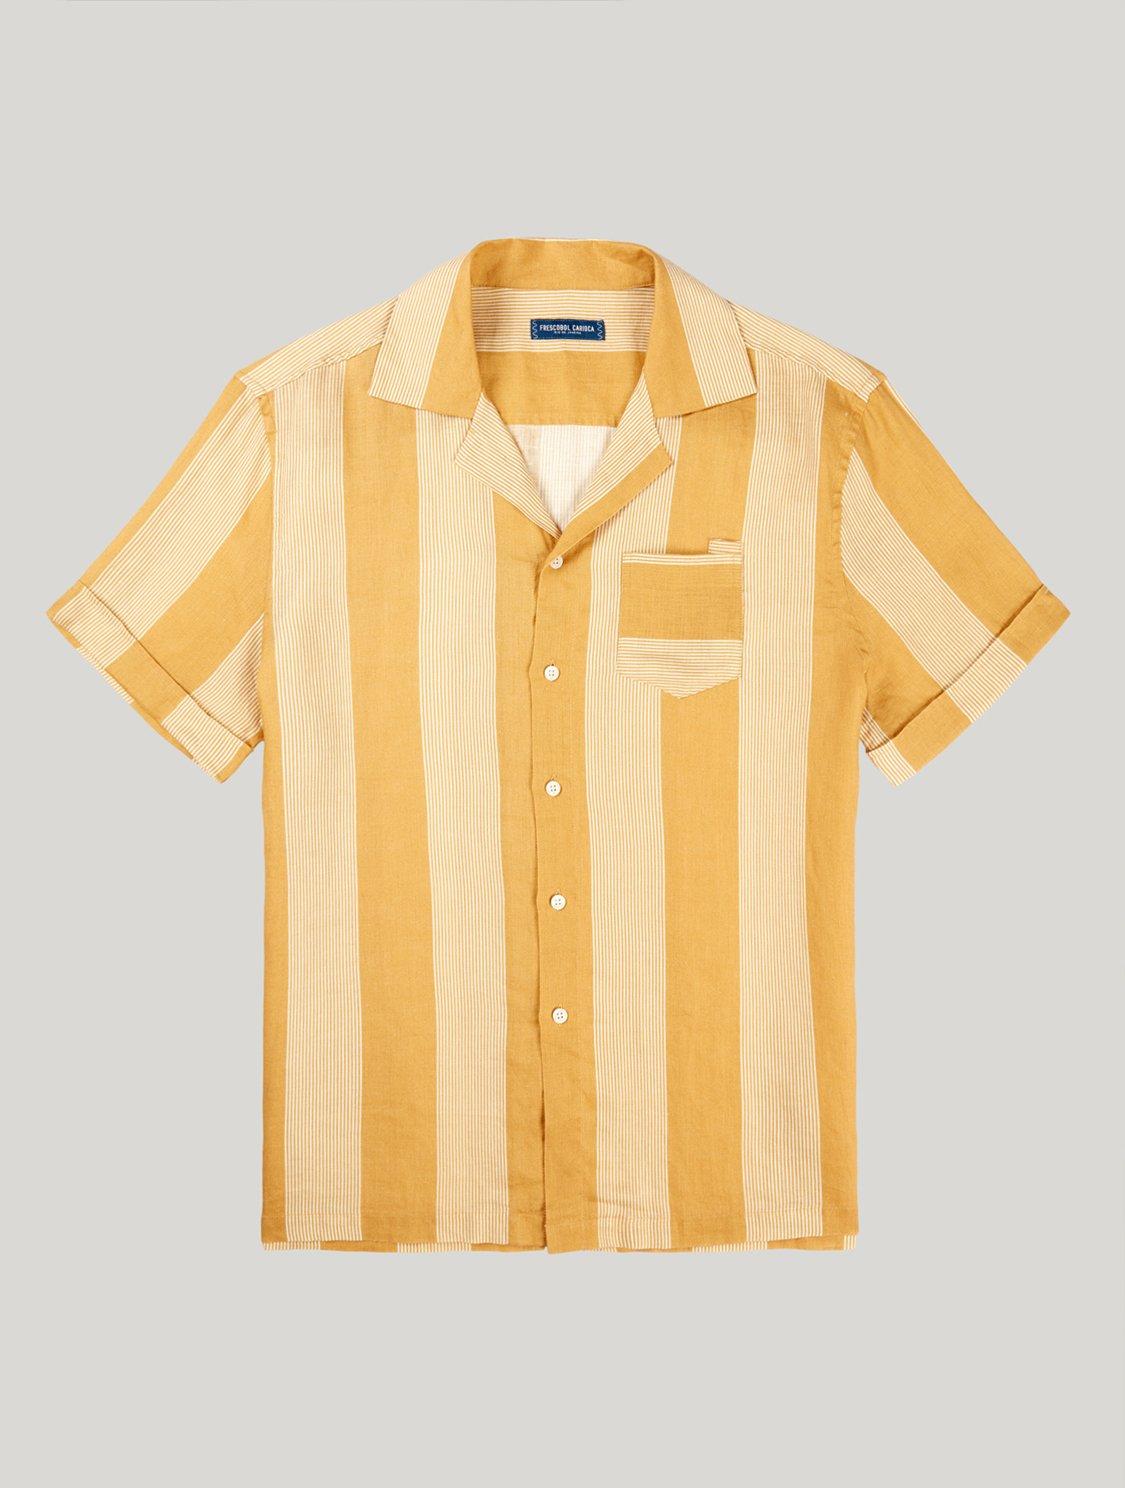 Thomas Shirt Cabana Stripe Print Twine & White M